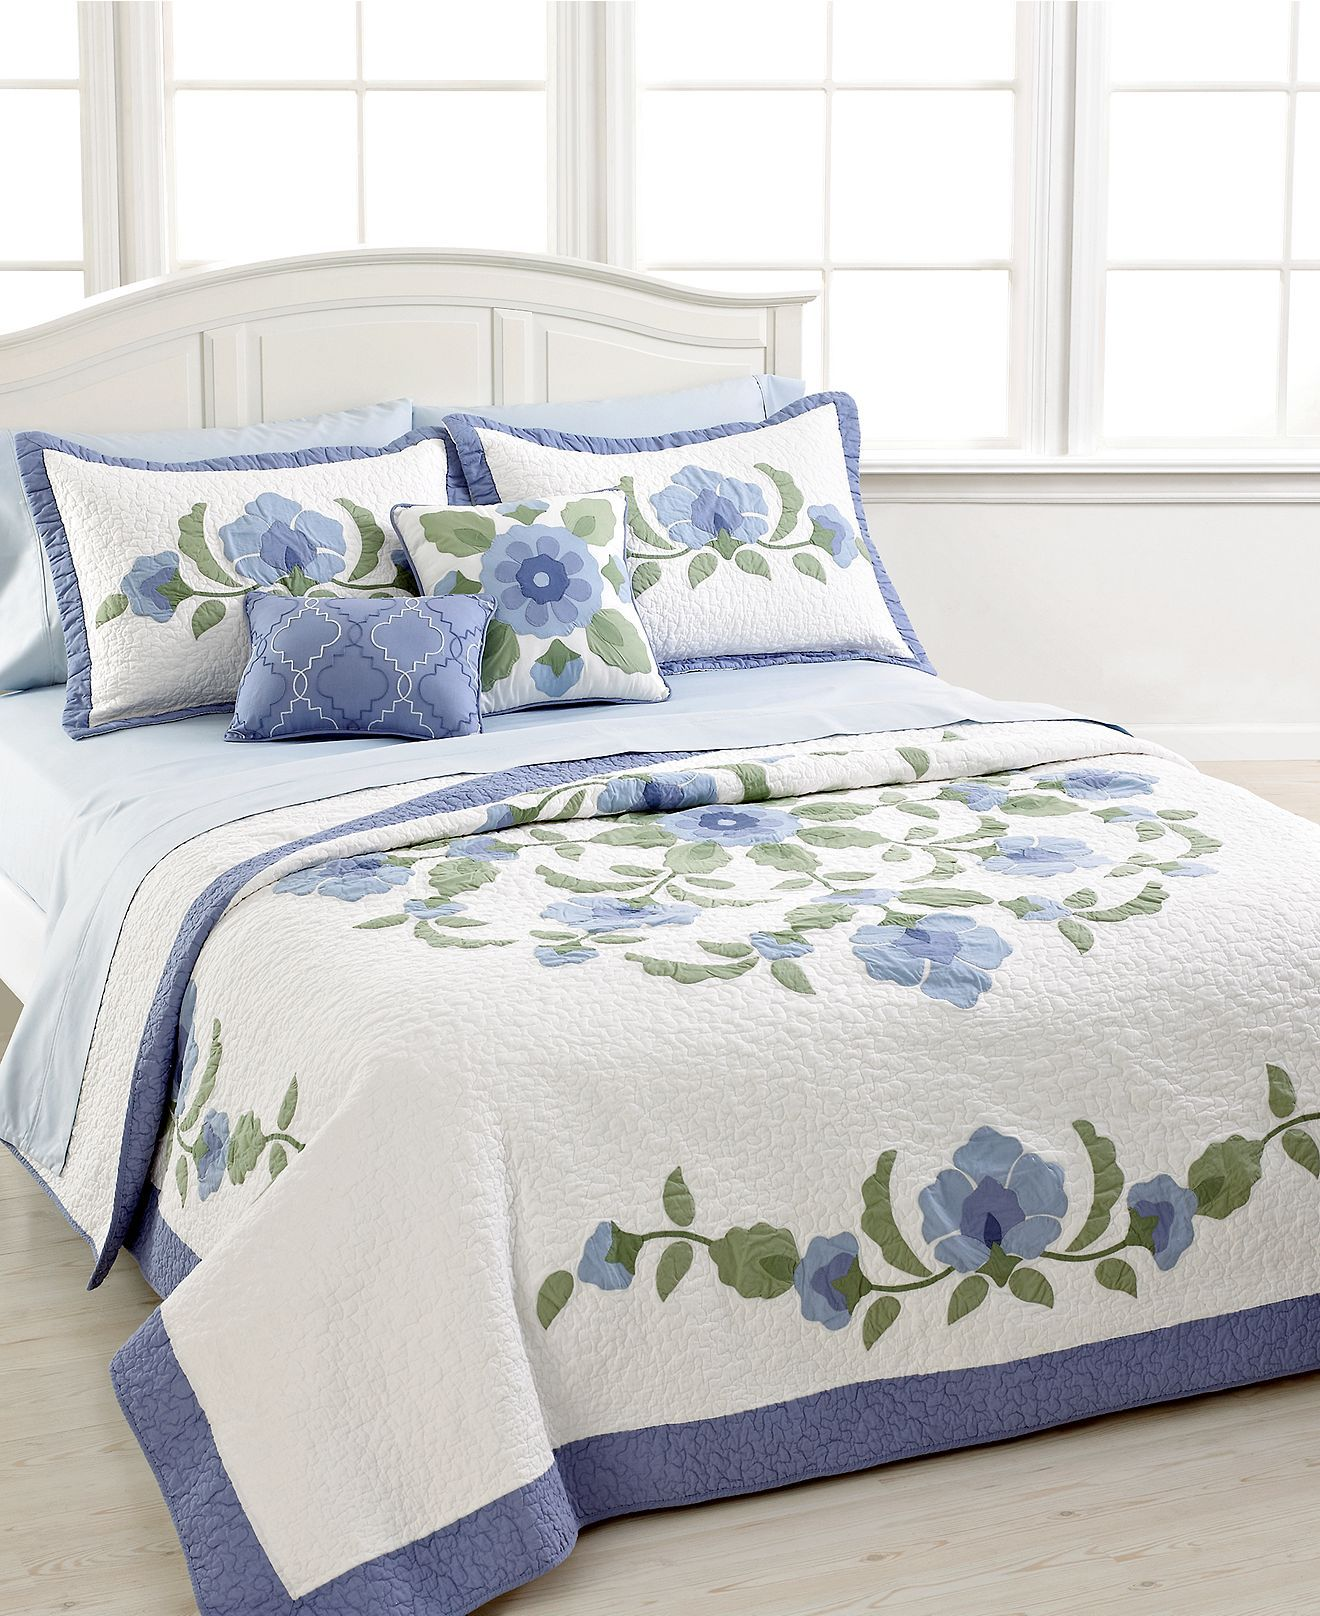 nostalgia home bedding brenda quilt collection quilts bedspreads bed bath macy 39 s. Black Bedroom Furniture Sets. Home Design Ideas